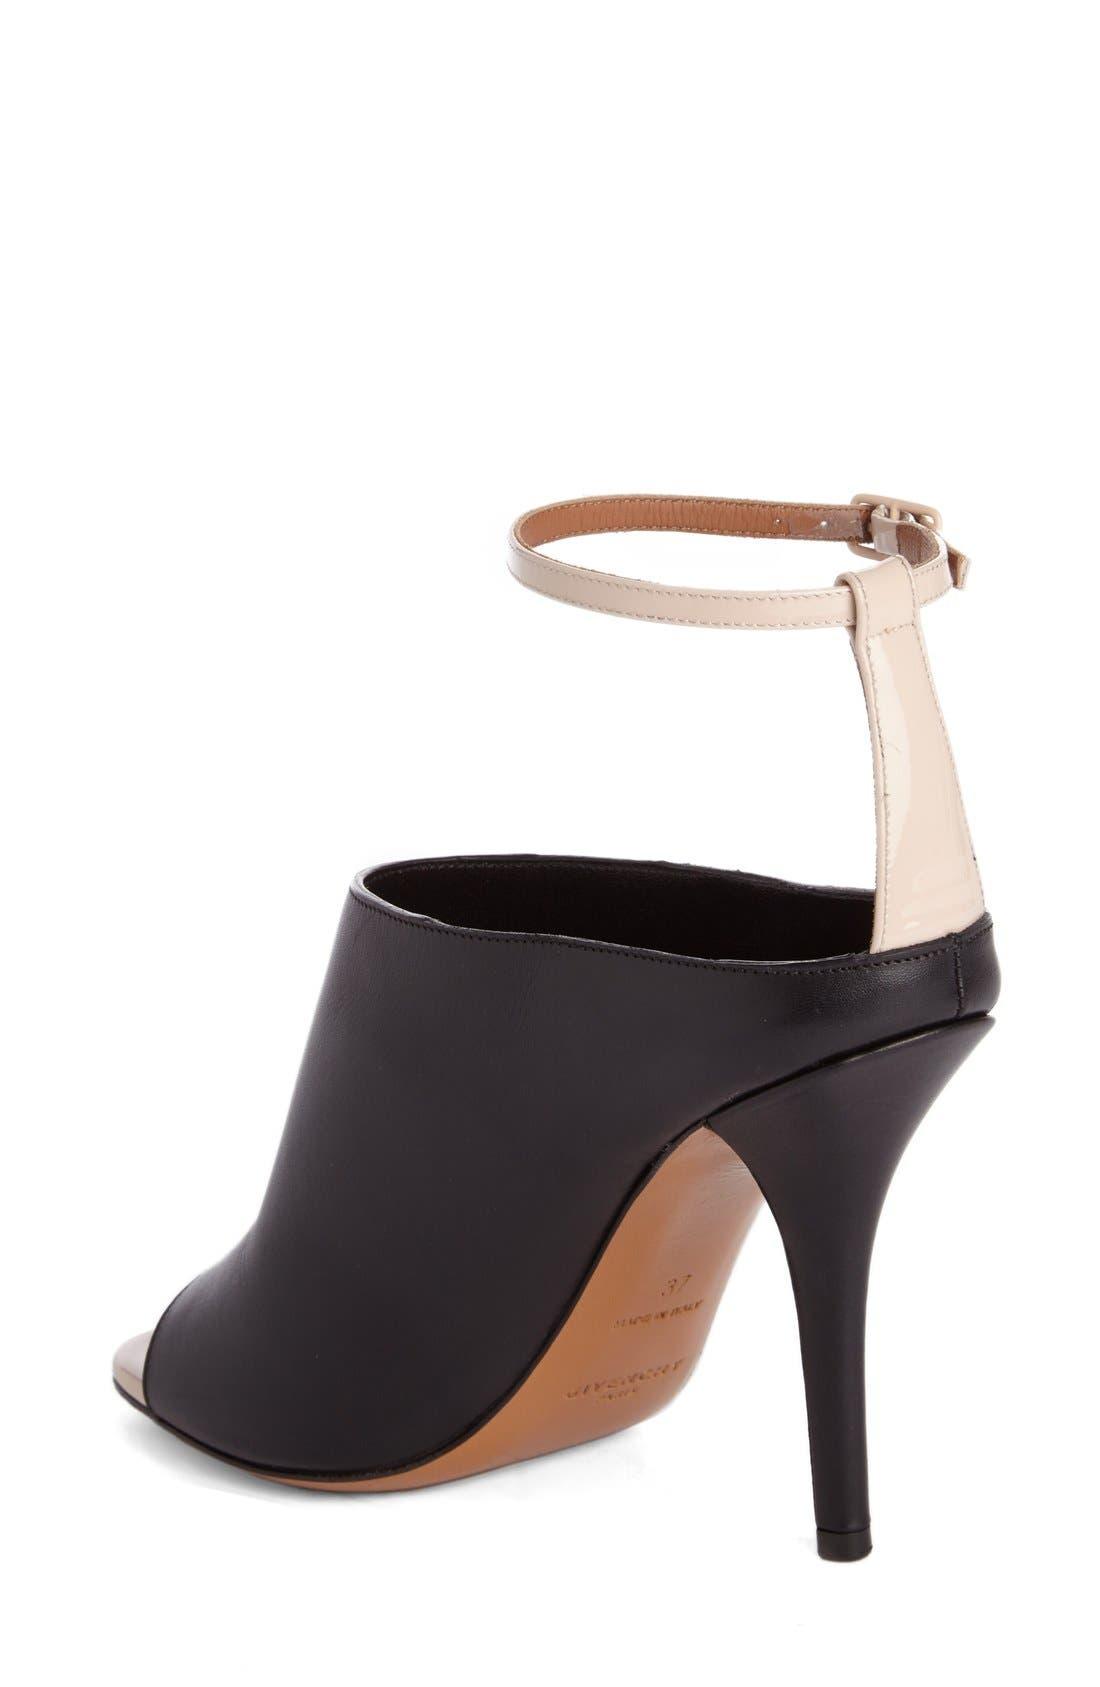 Alternate Image 2  - Givenchy Ankle Strap Sandal (Women)